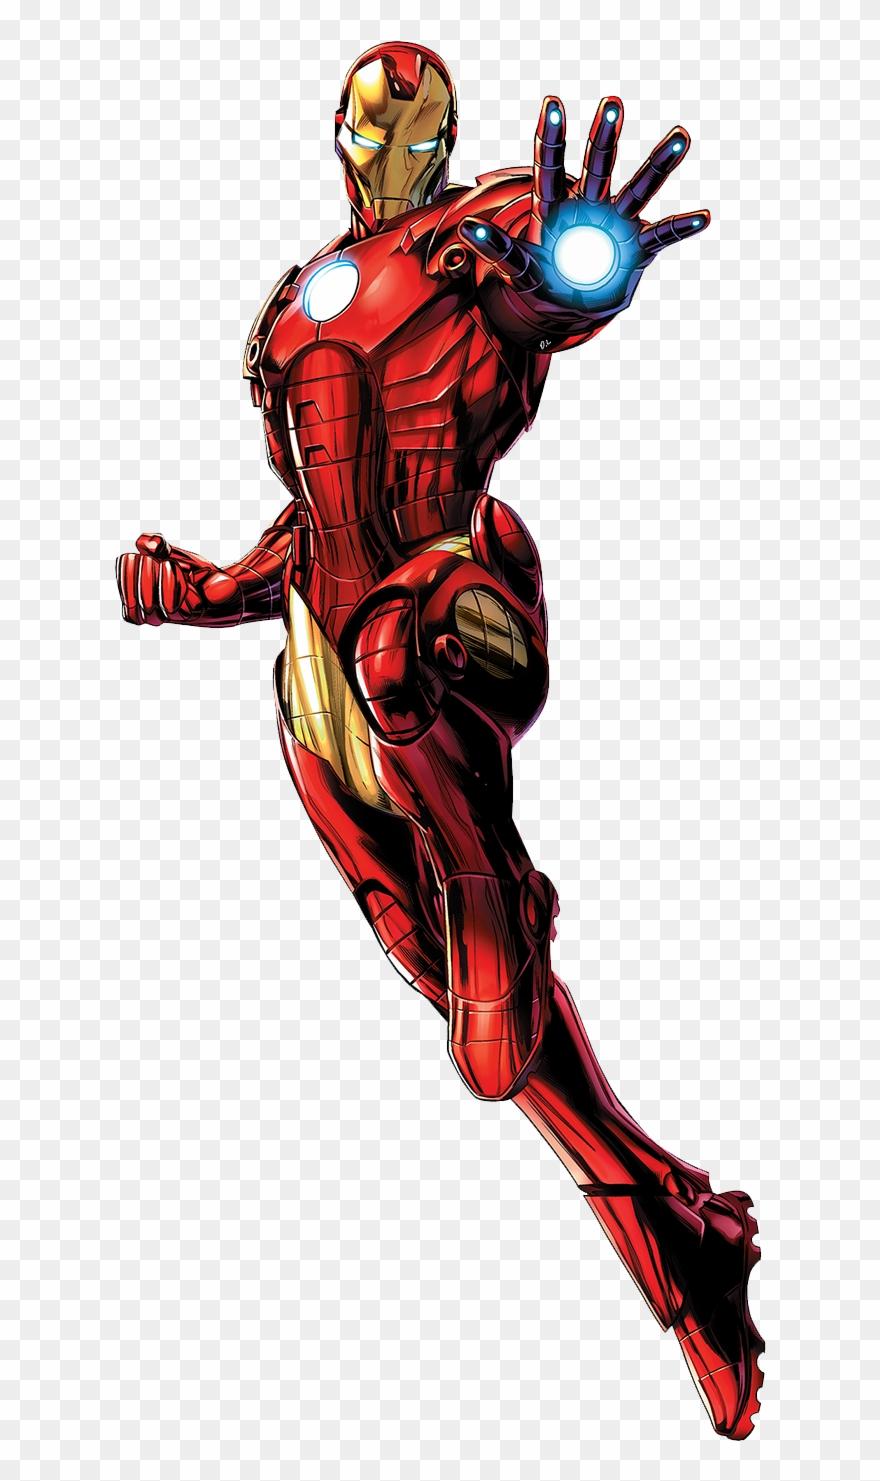 Marvel iron man pinclipart. Avengers clipart ironman